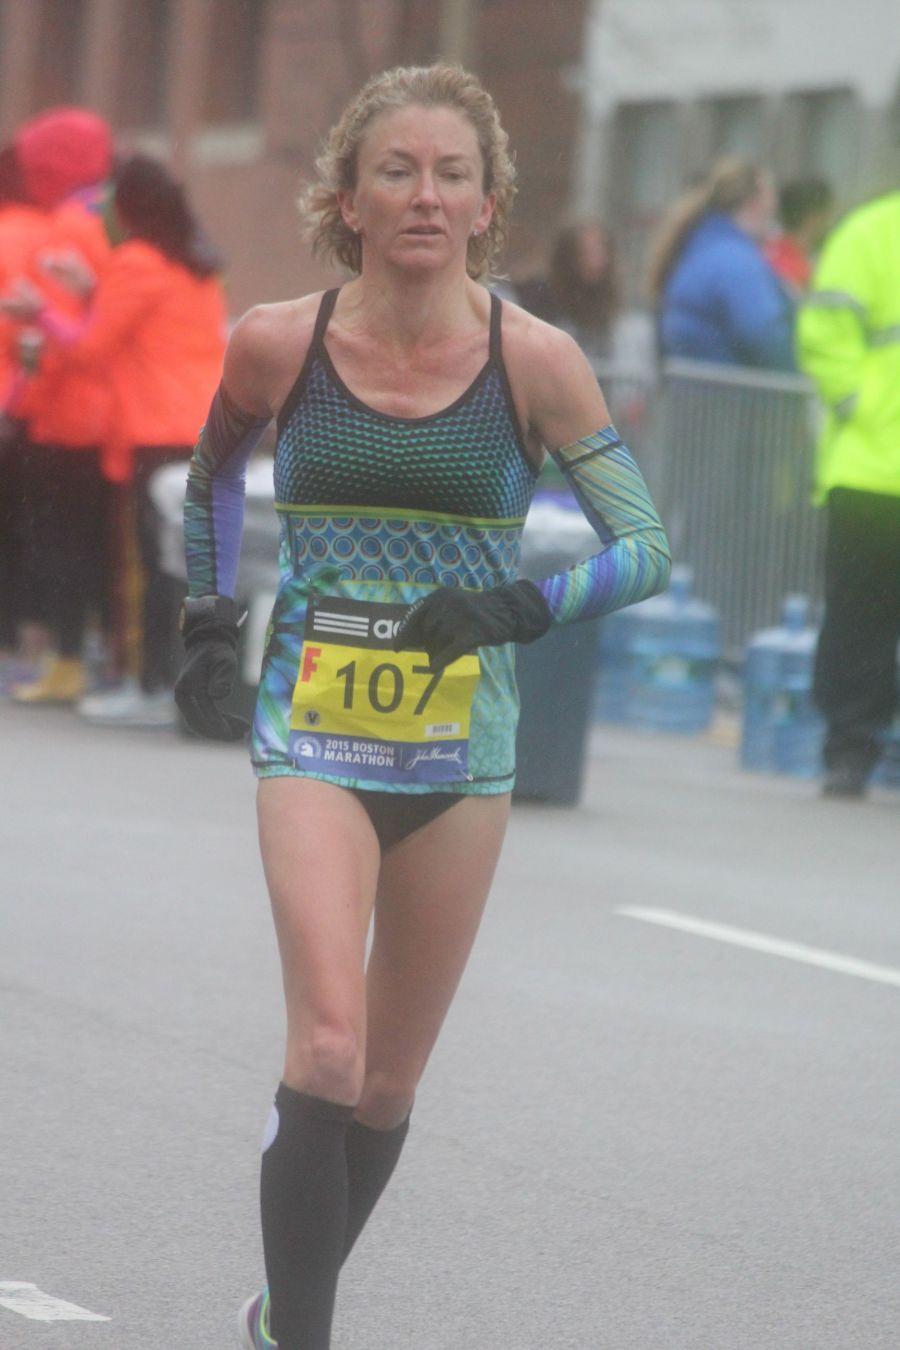 boston marathon april 20 2015 racer number 107